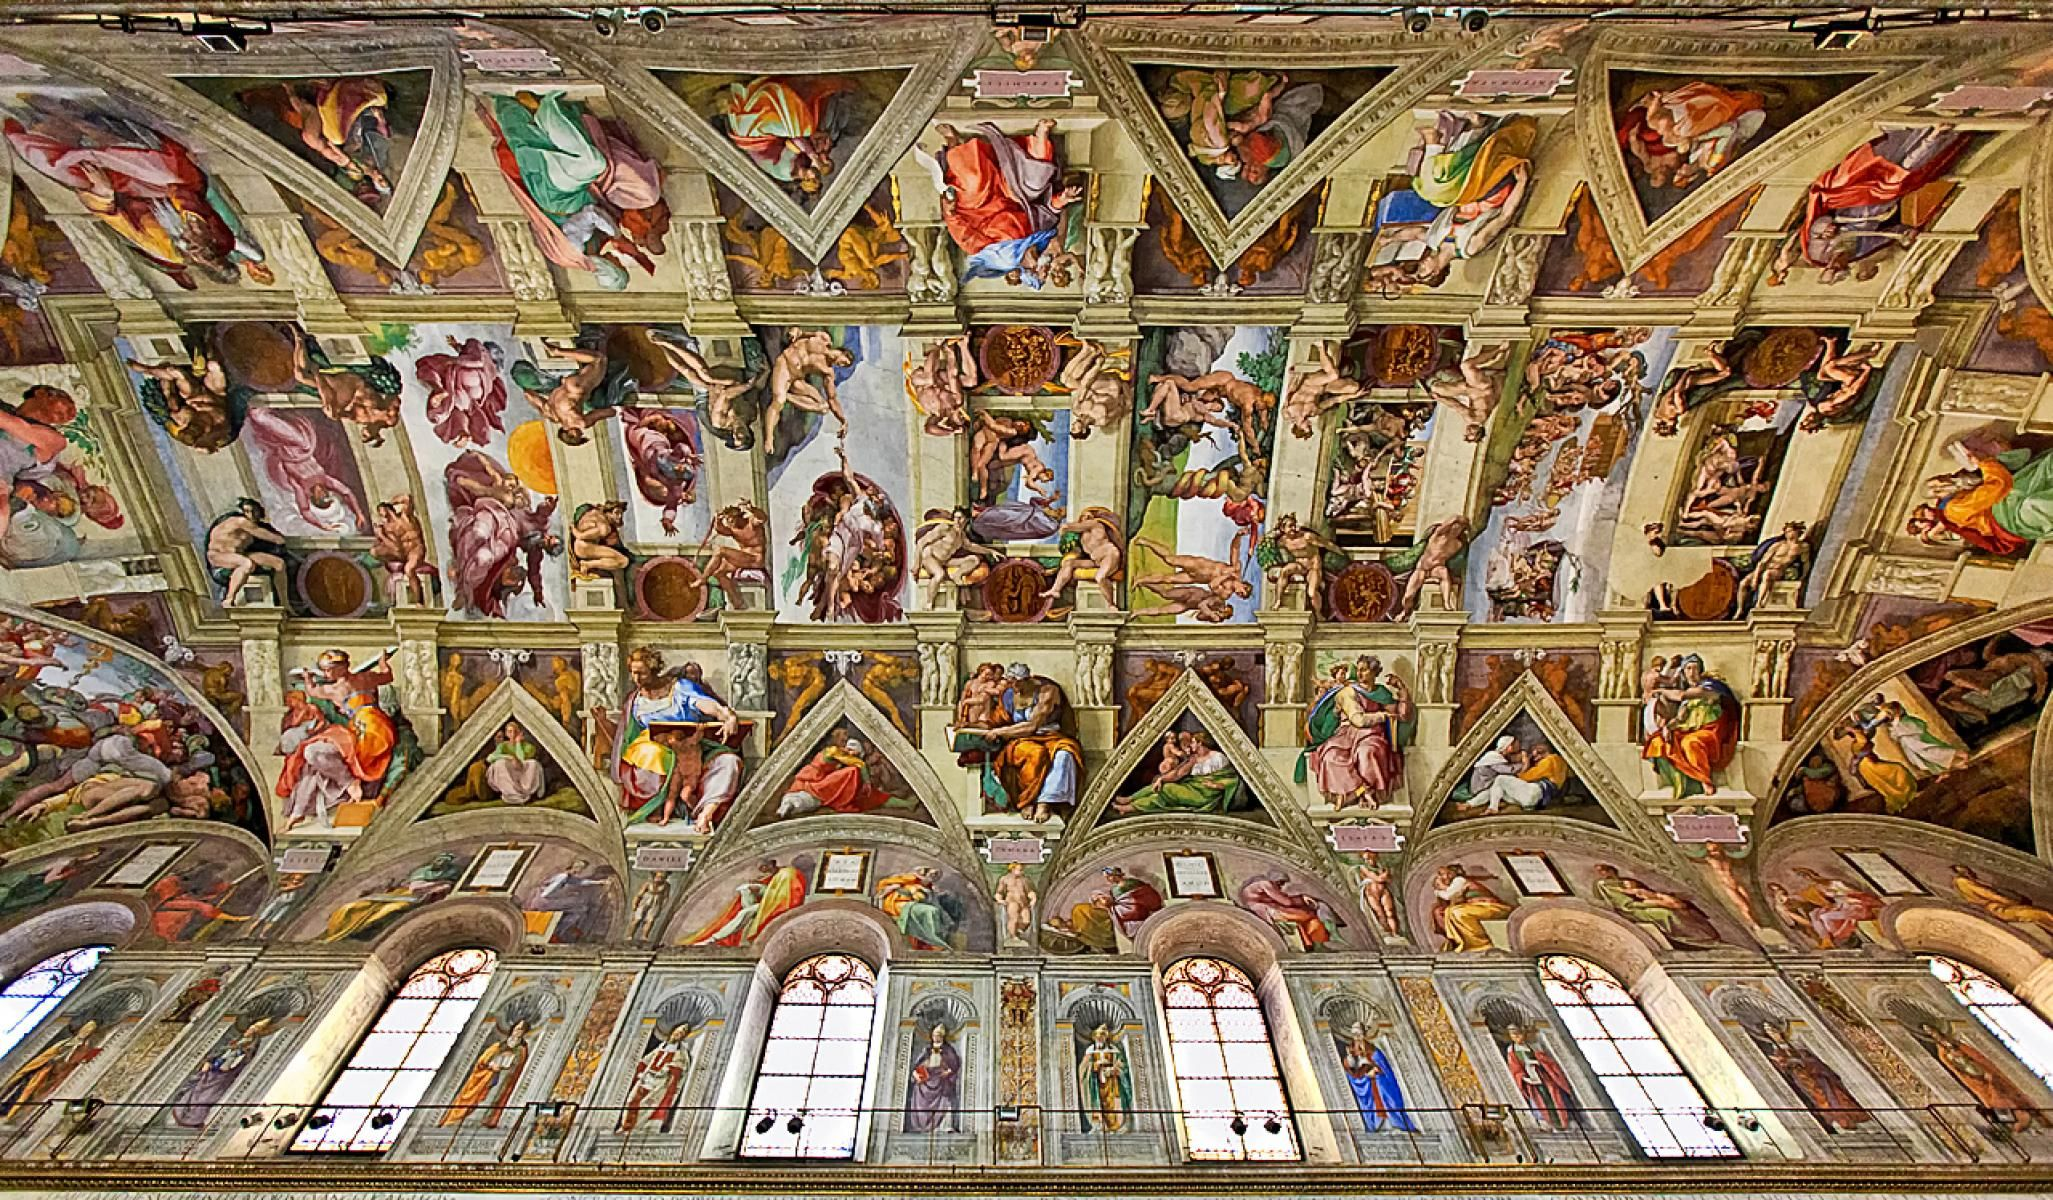 Michelangelo Buonarotti Ceiling Of The Sistine Chapel